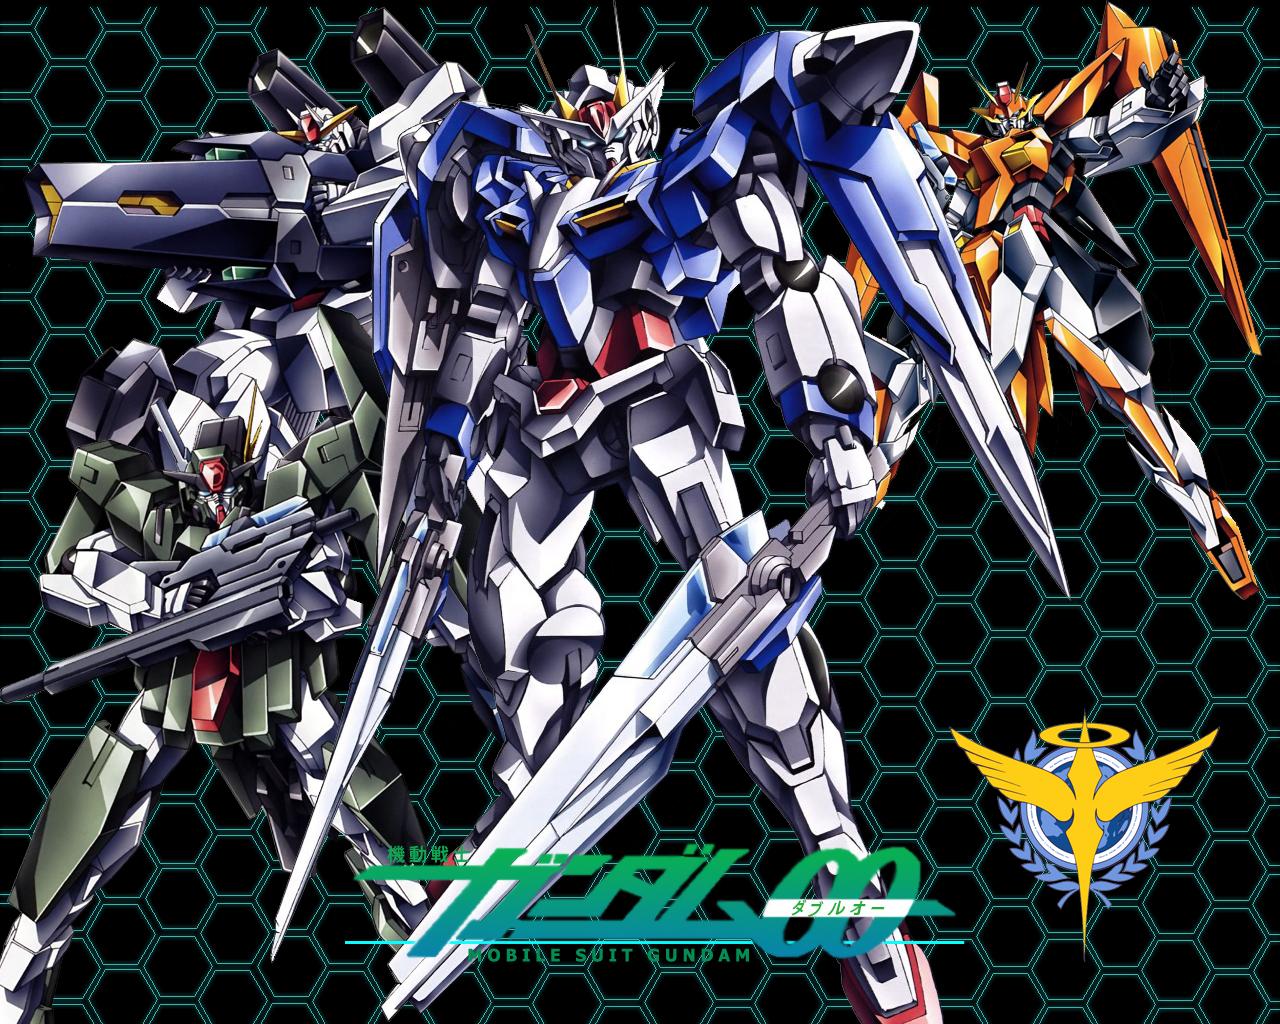 http://3.bp.blogspot.com/_AFPNTdm5dSw/TQ7GP_tTncI/AAAAAAAAABs/Q4AHUo9O73o/s1600/Gundam_00_Season_2_Wallpaper_by_shinigami117.jpg